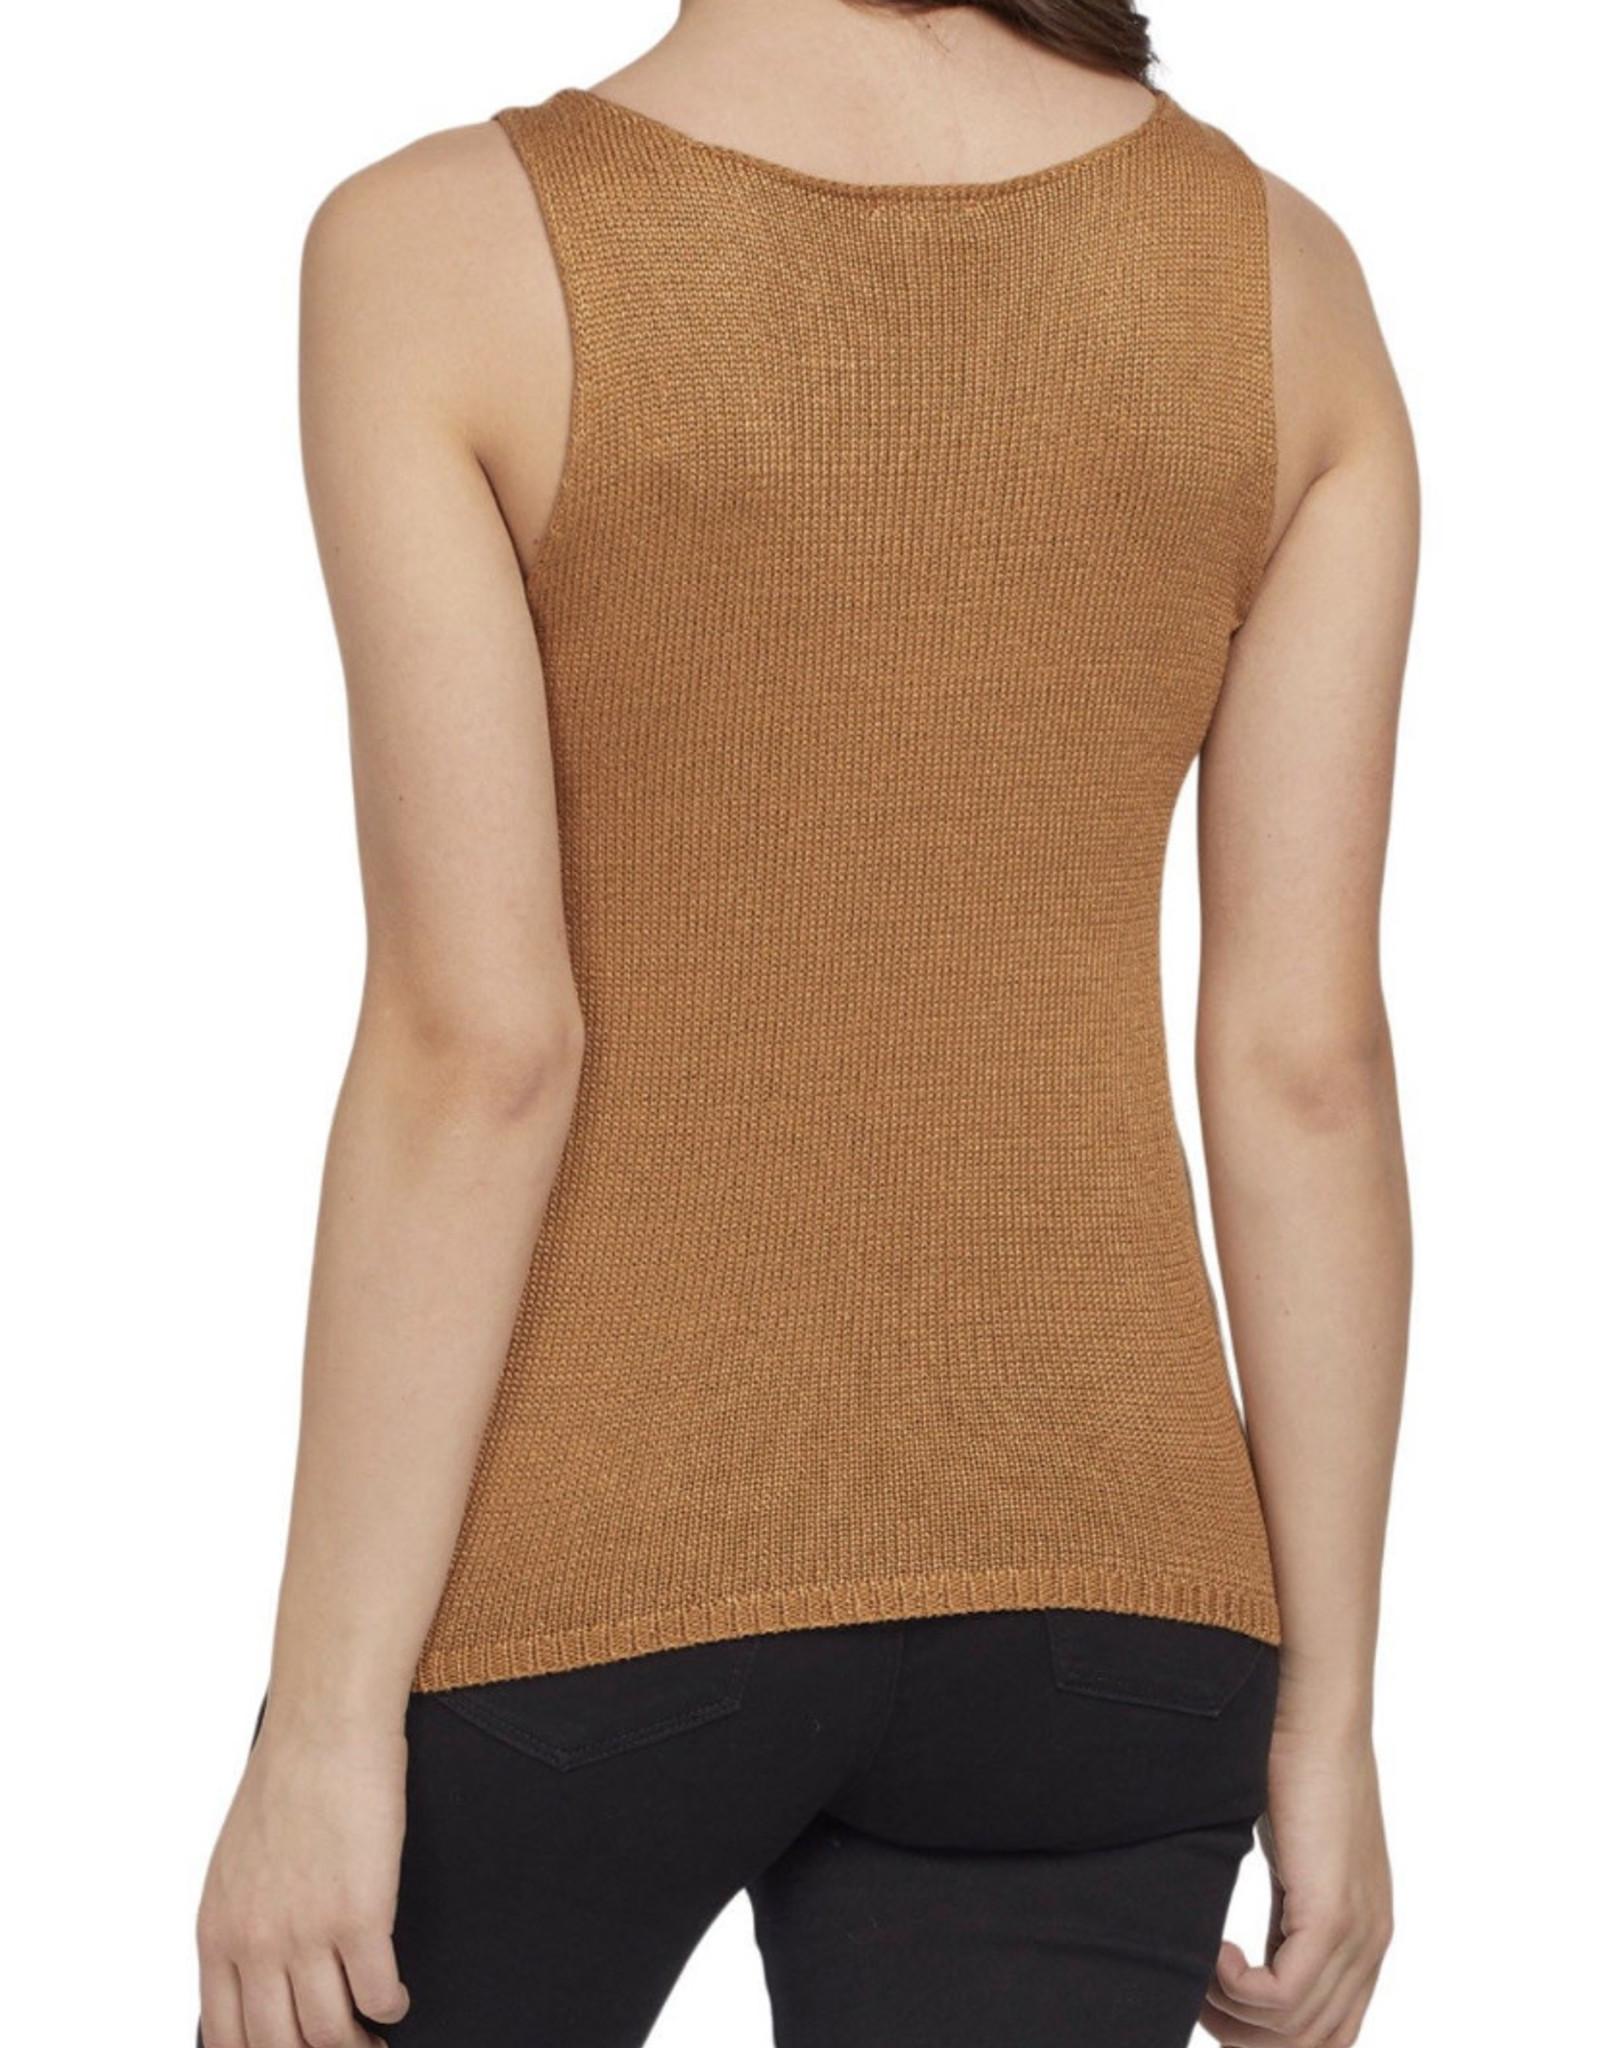 Sweater cami Ochre